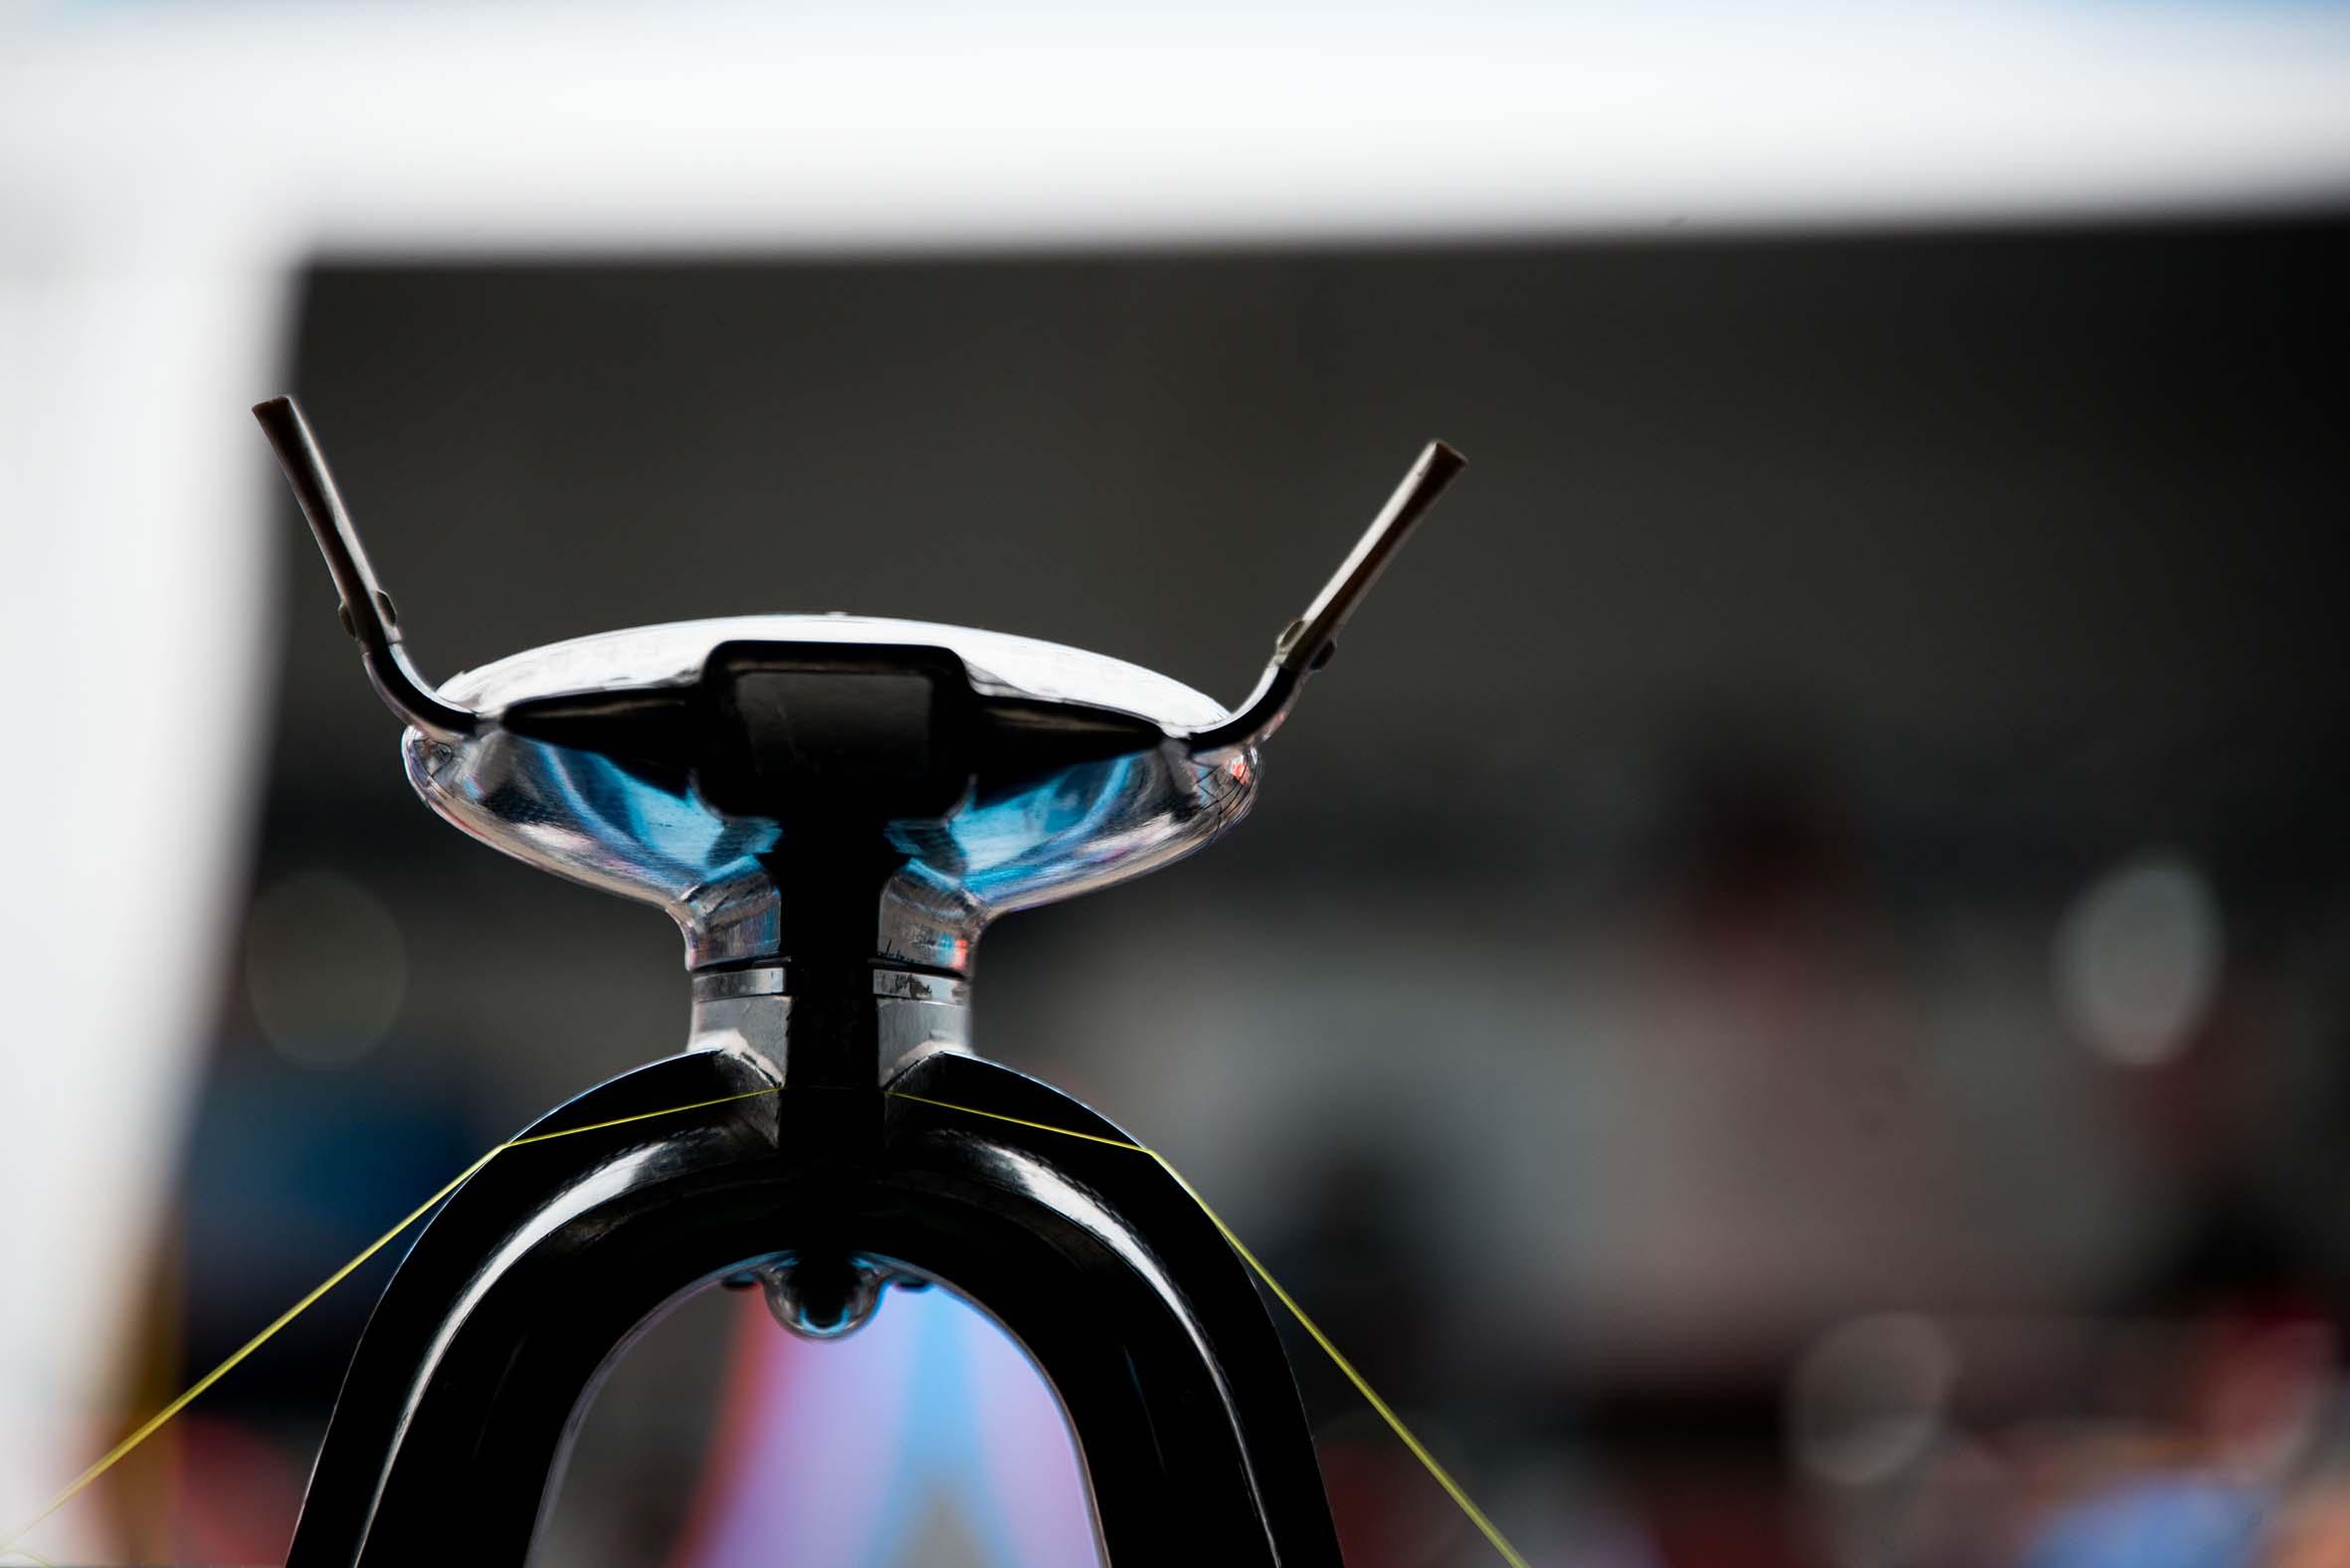 Spacesuit-Media-Marta-Rovatti-Studihrad-FIA-Formula-E-New-York-ePrix-2017MGR_9217